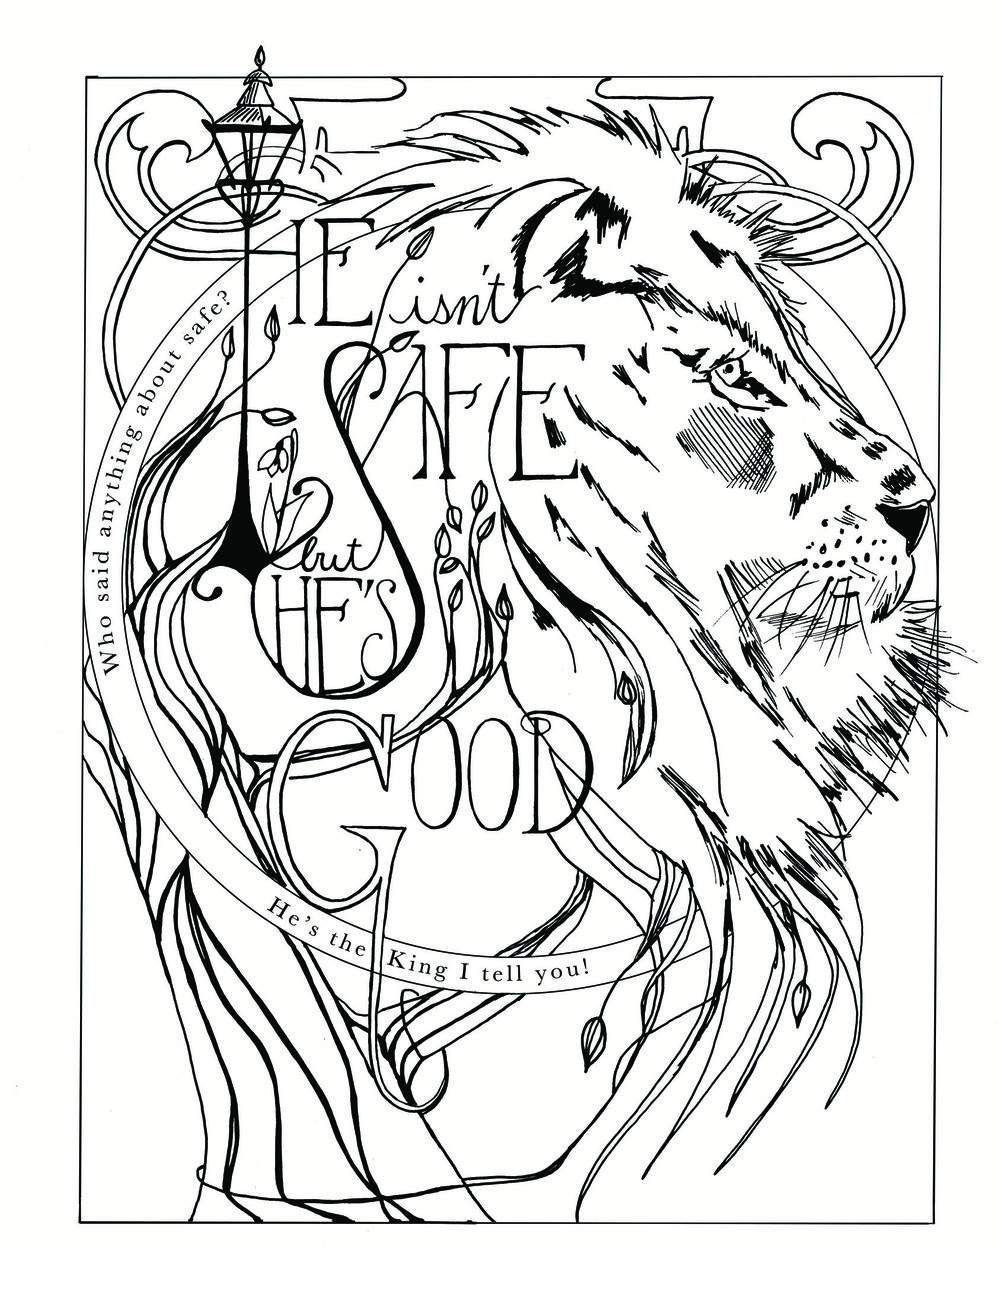 Narnia Wardrobe Drawing at GetDrawings.com | Free for personal use ...